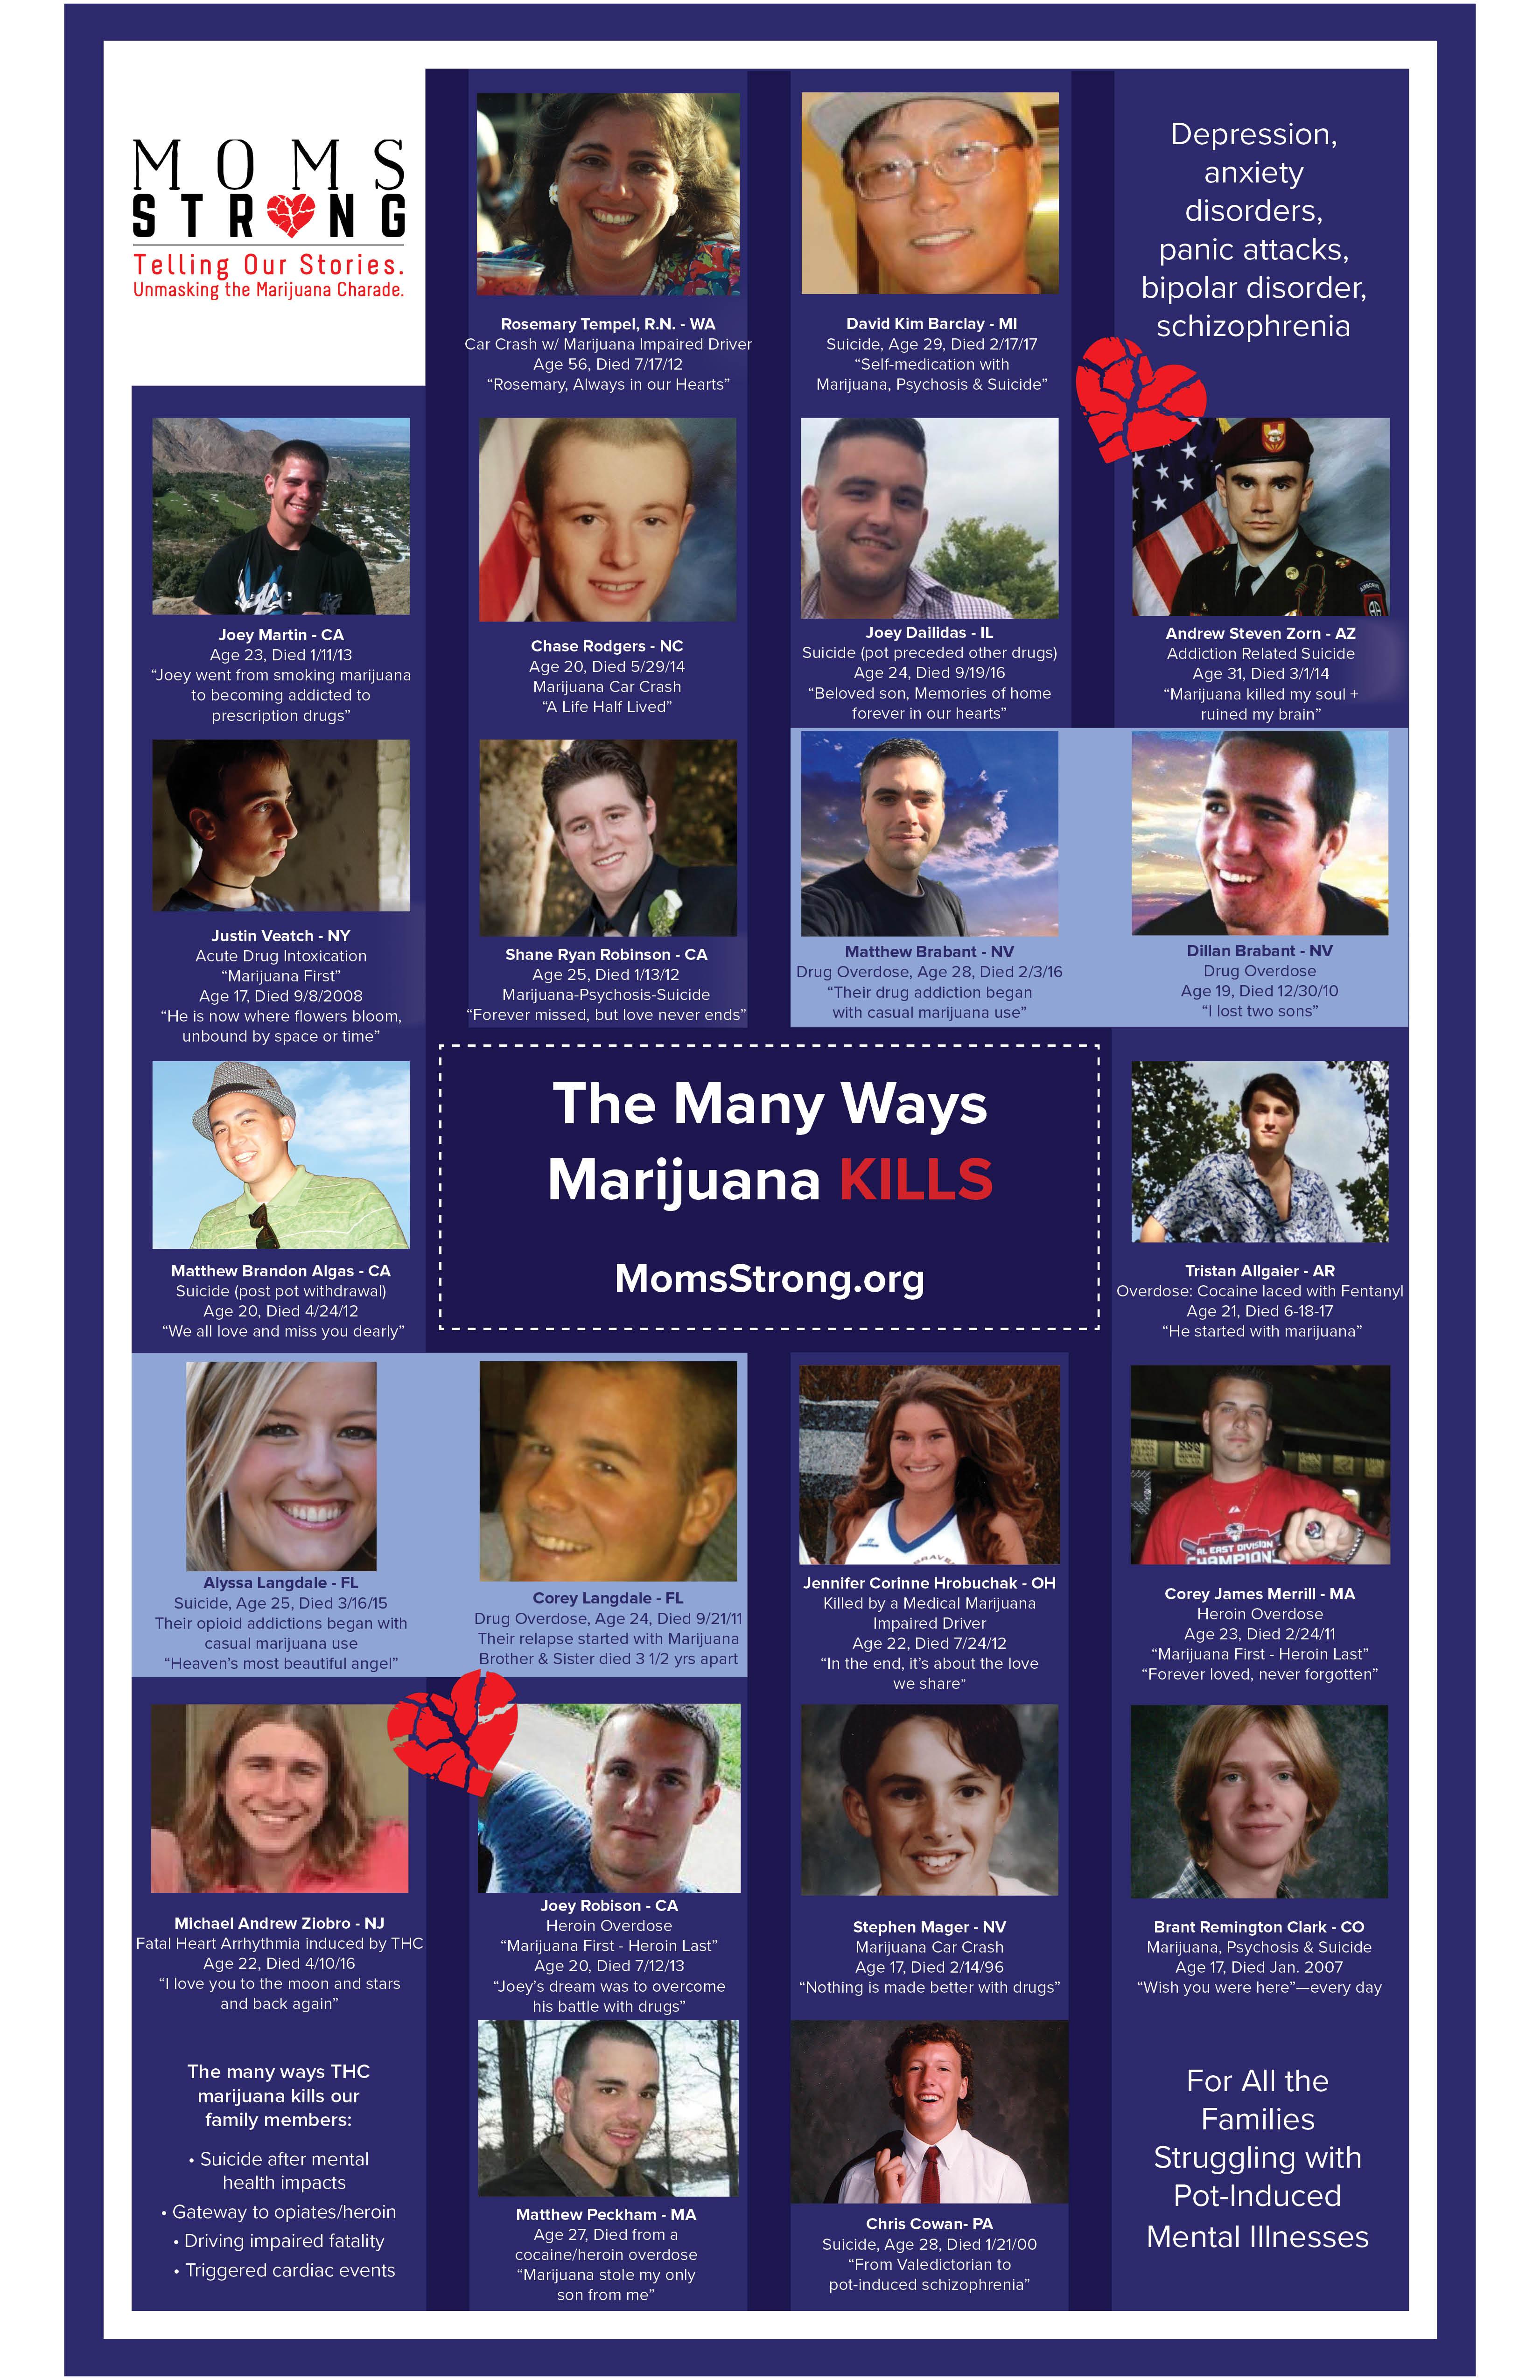 memorial-quilt-marijuana-deaths